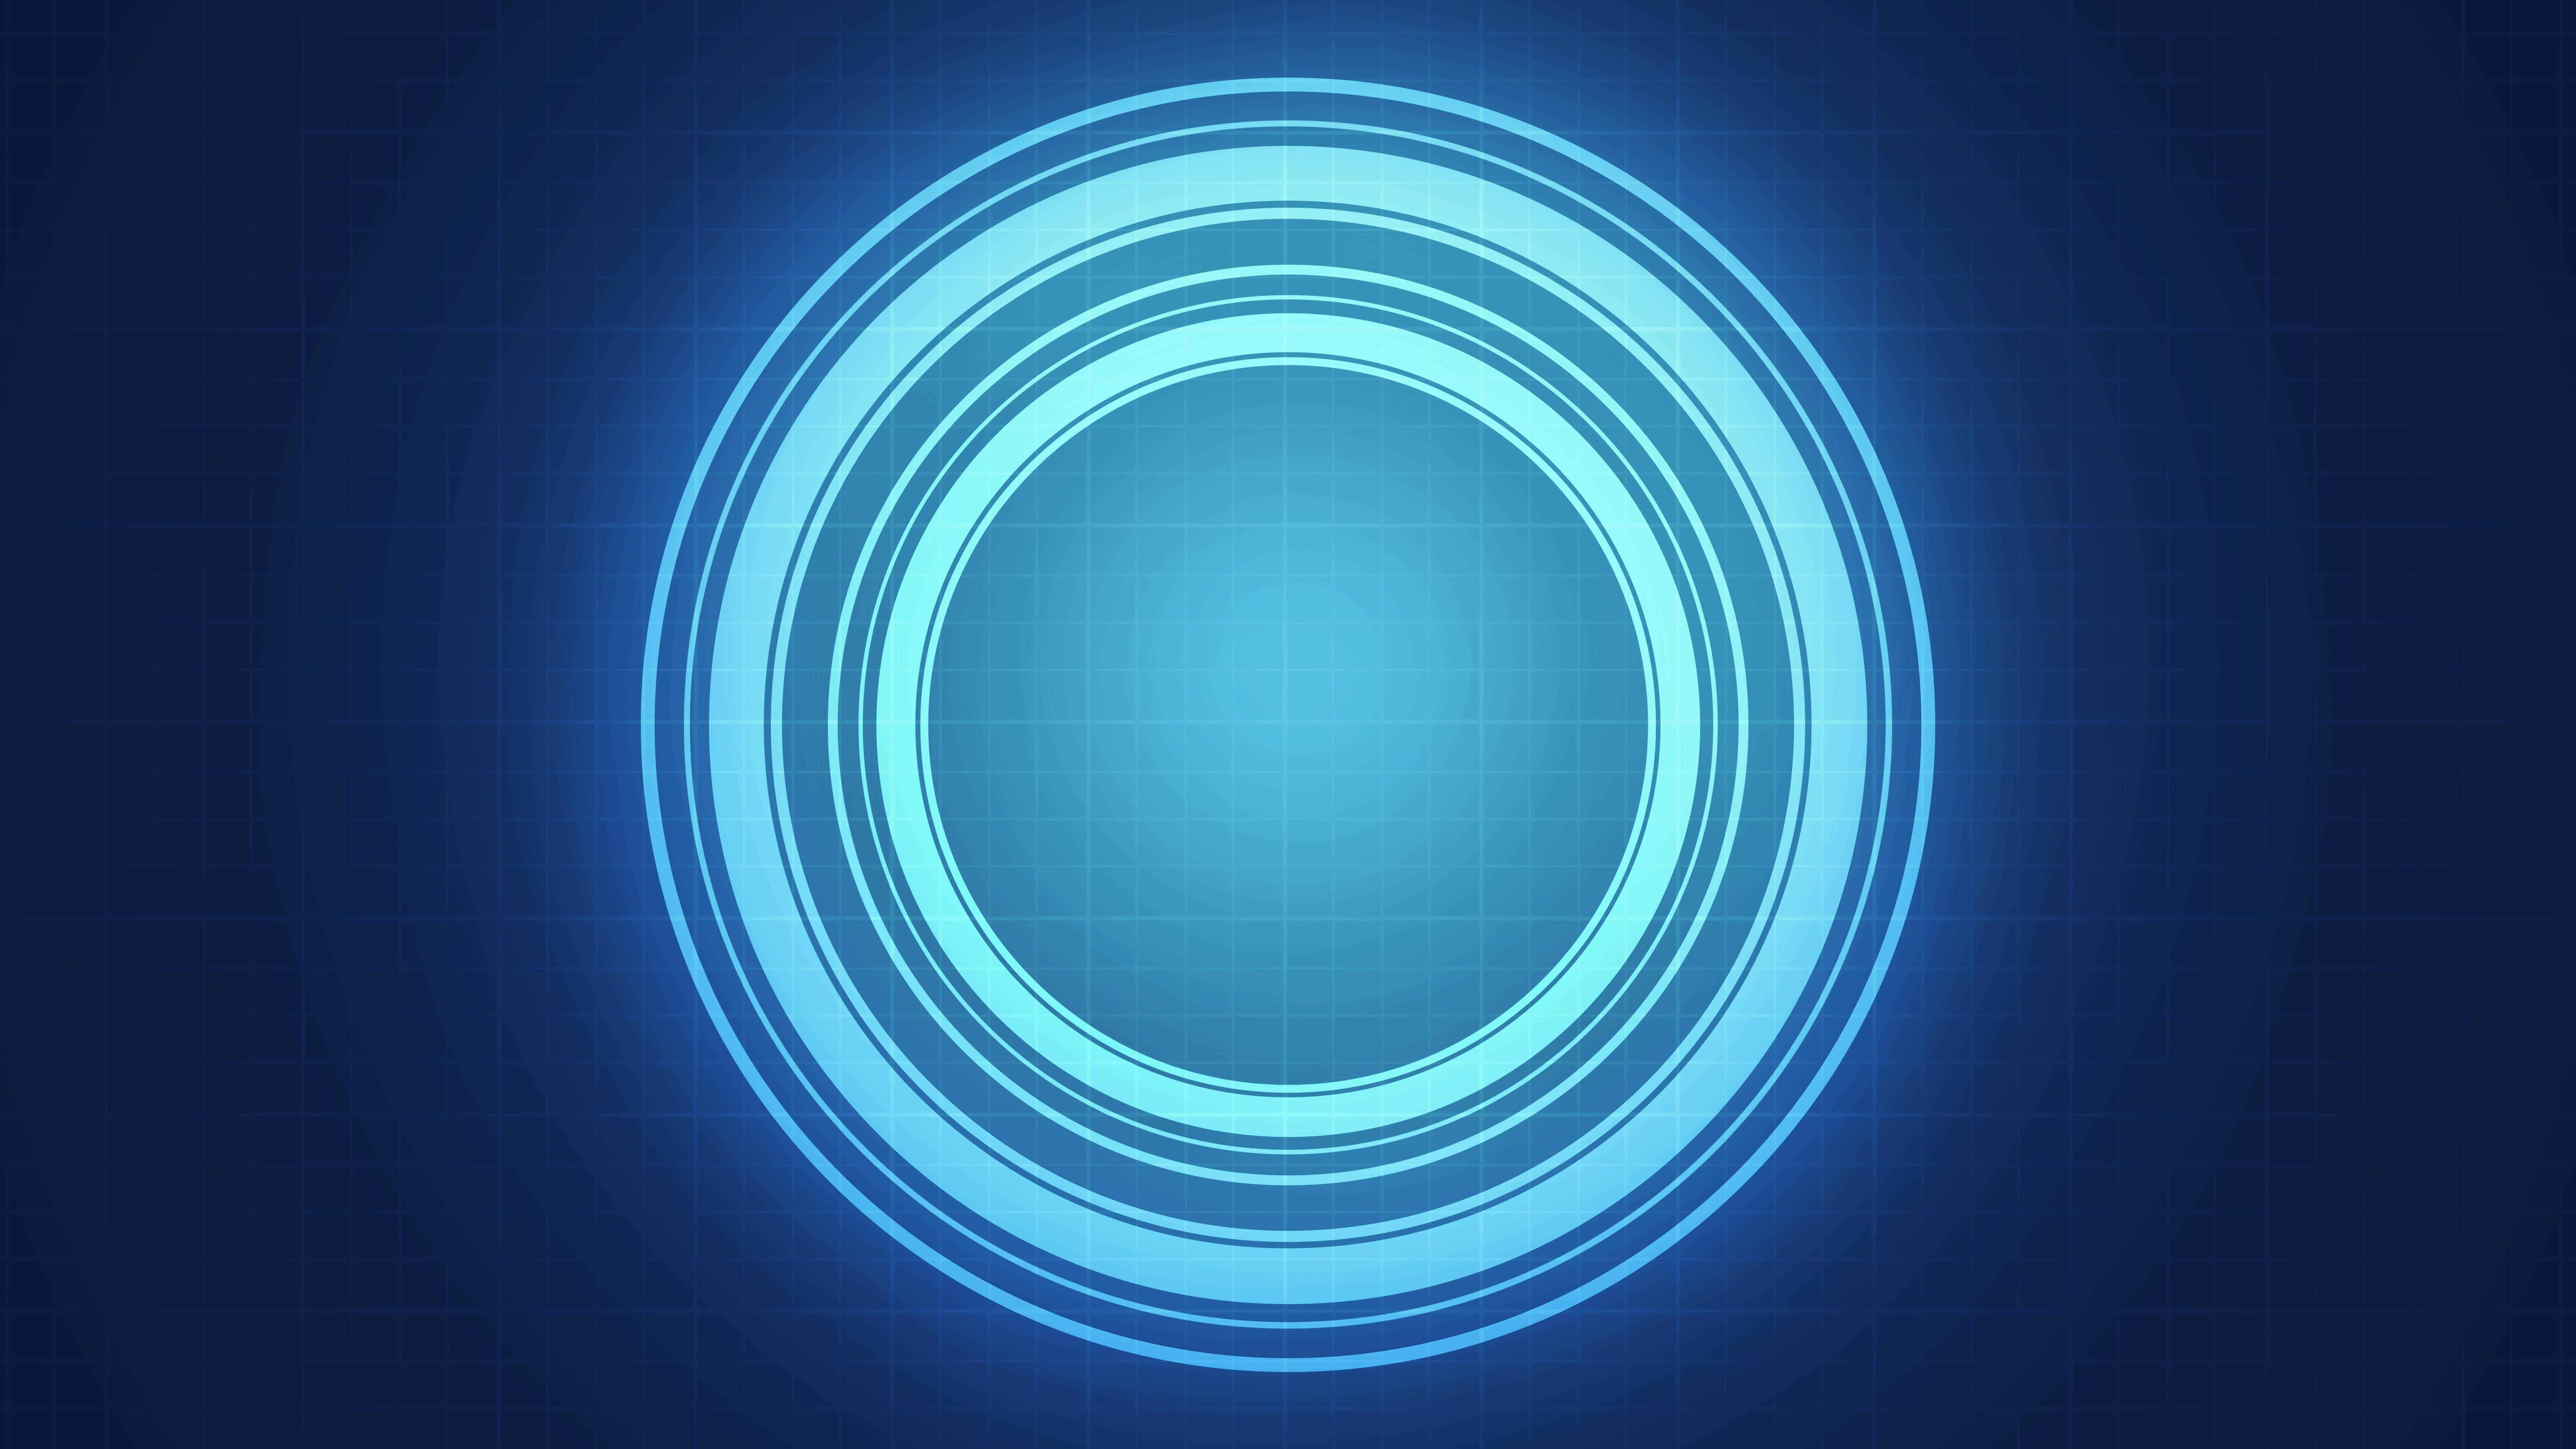 Abstract Blue Circles UHD 8K Wallpaper Pixelz